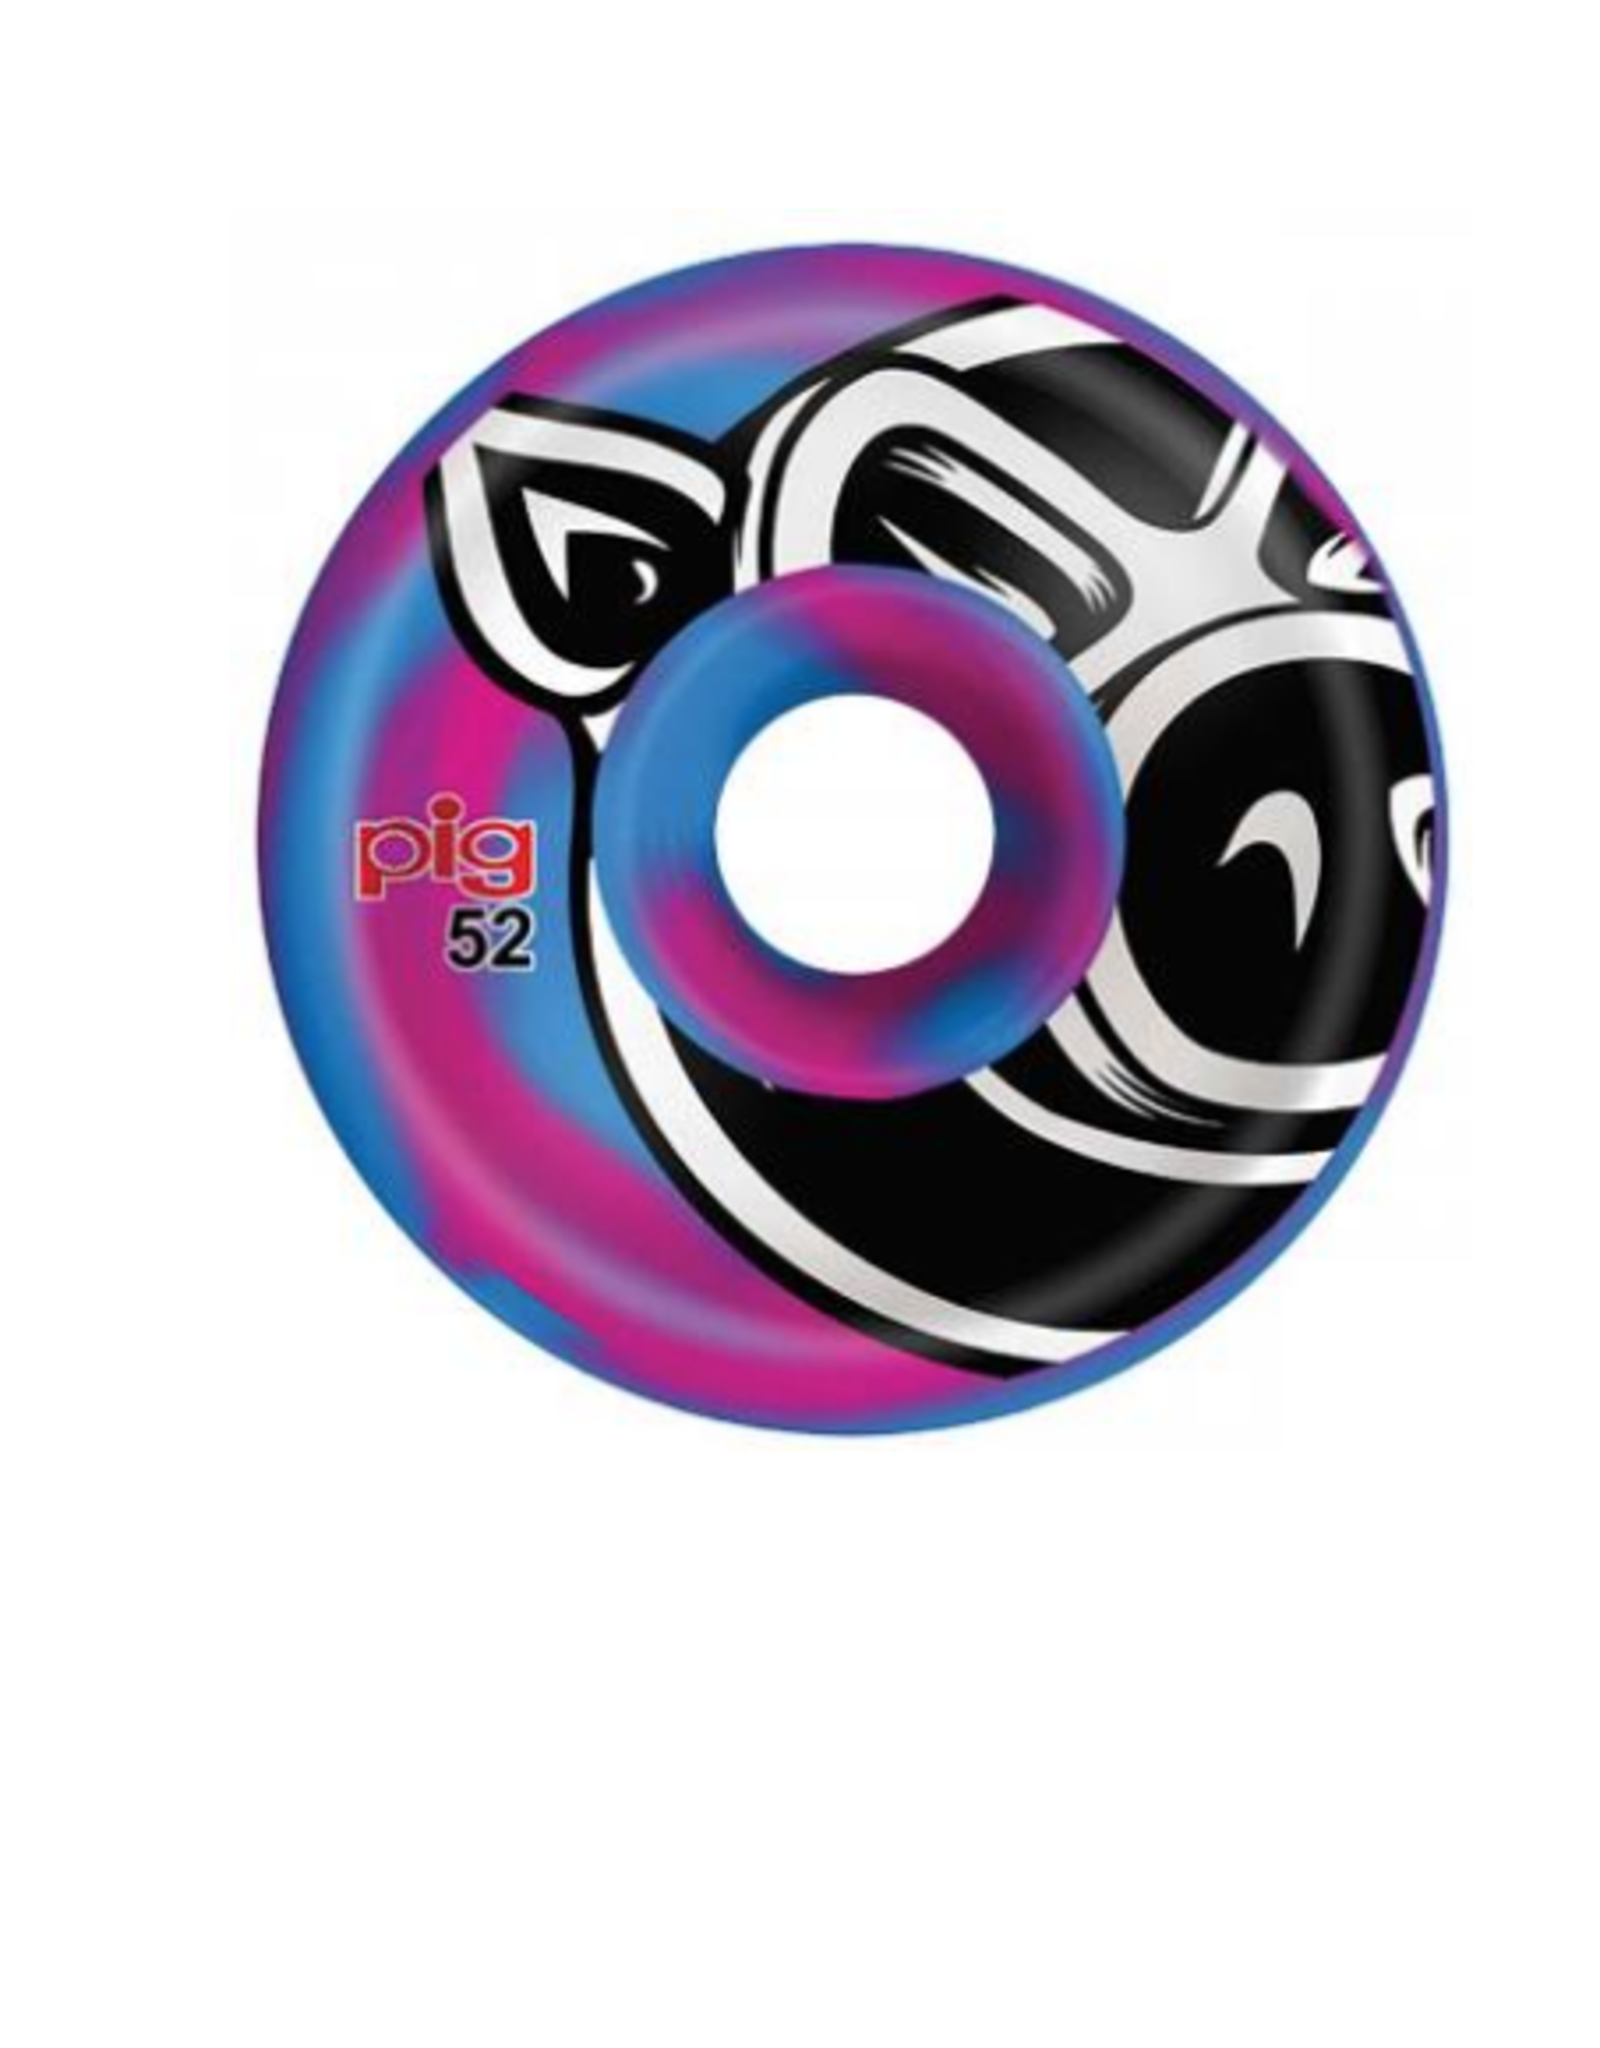 PIG Pig Wheels 52mm Pig Head Blue/Pink Swirl C-Line Skateboard Wheels<br /> Regular price<br /> $34.95